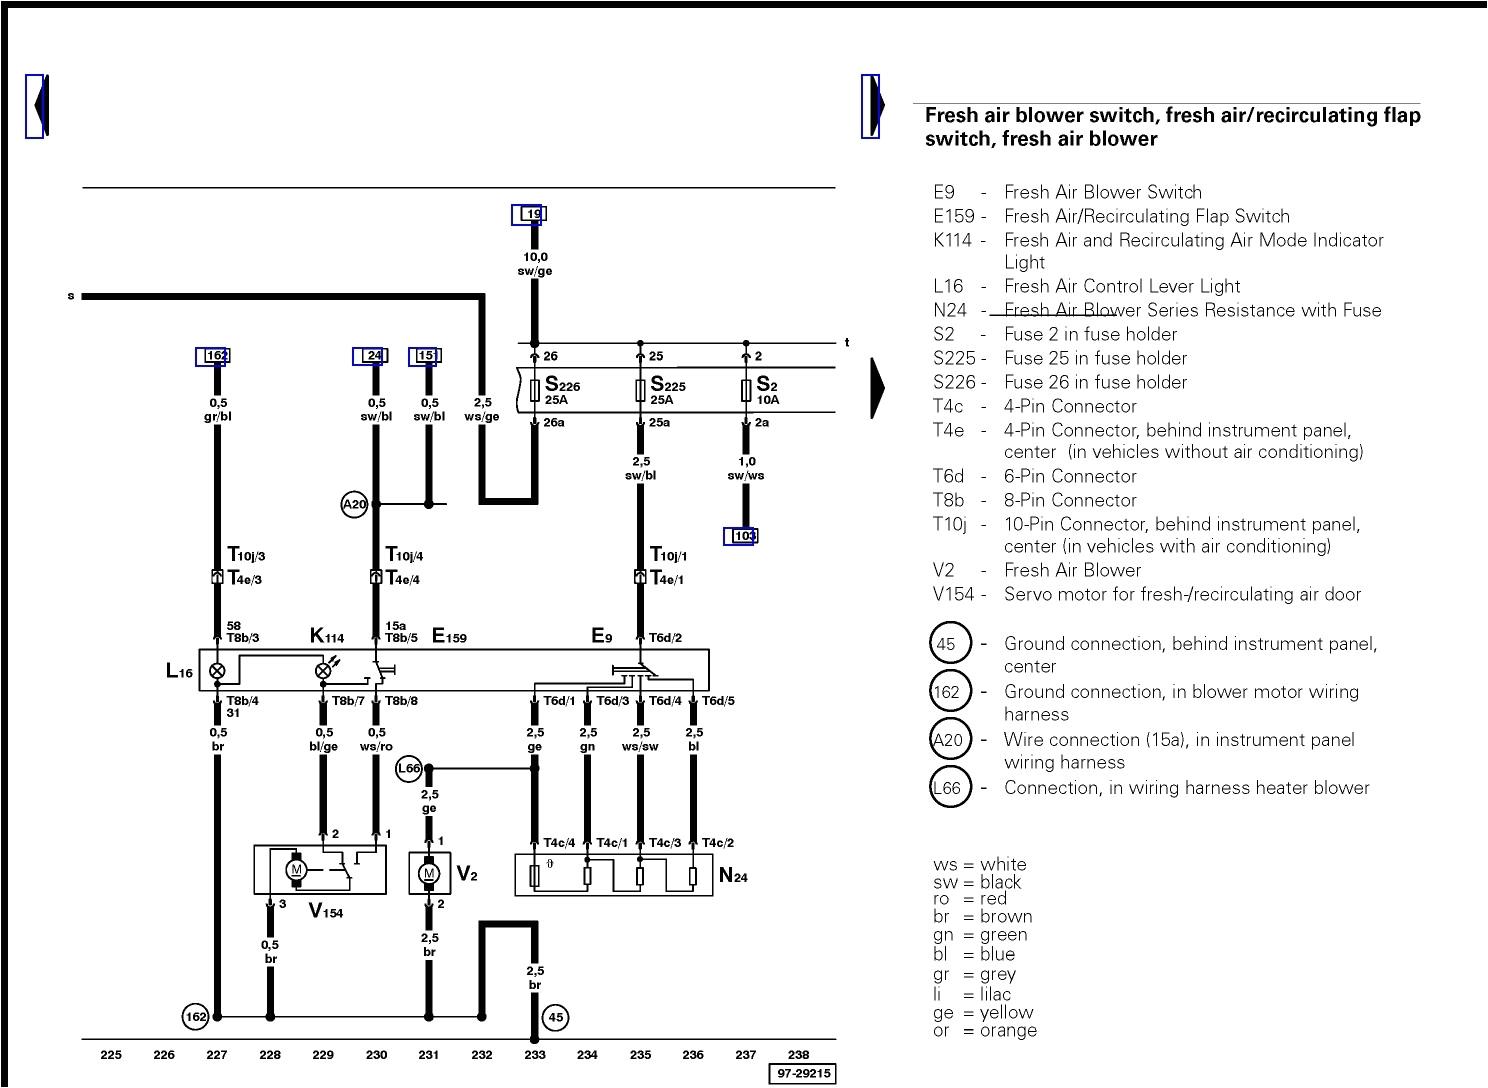 2000 jetta cruise control wiring diagram wiring diagram 2000 jetta cruise control wiring diagram